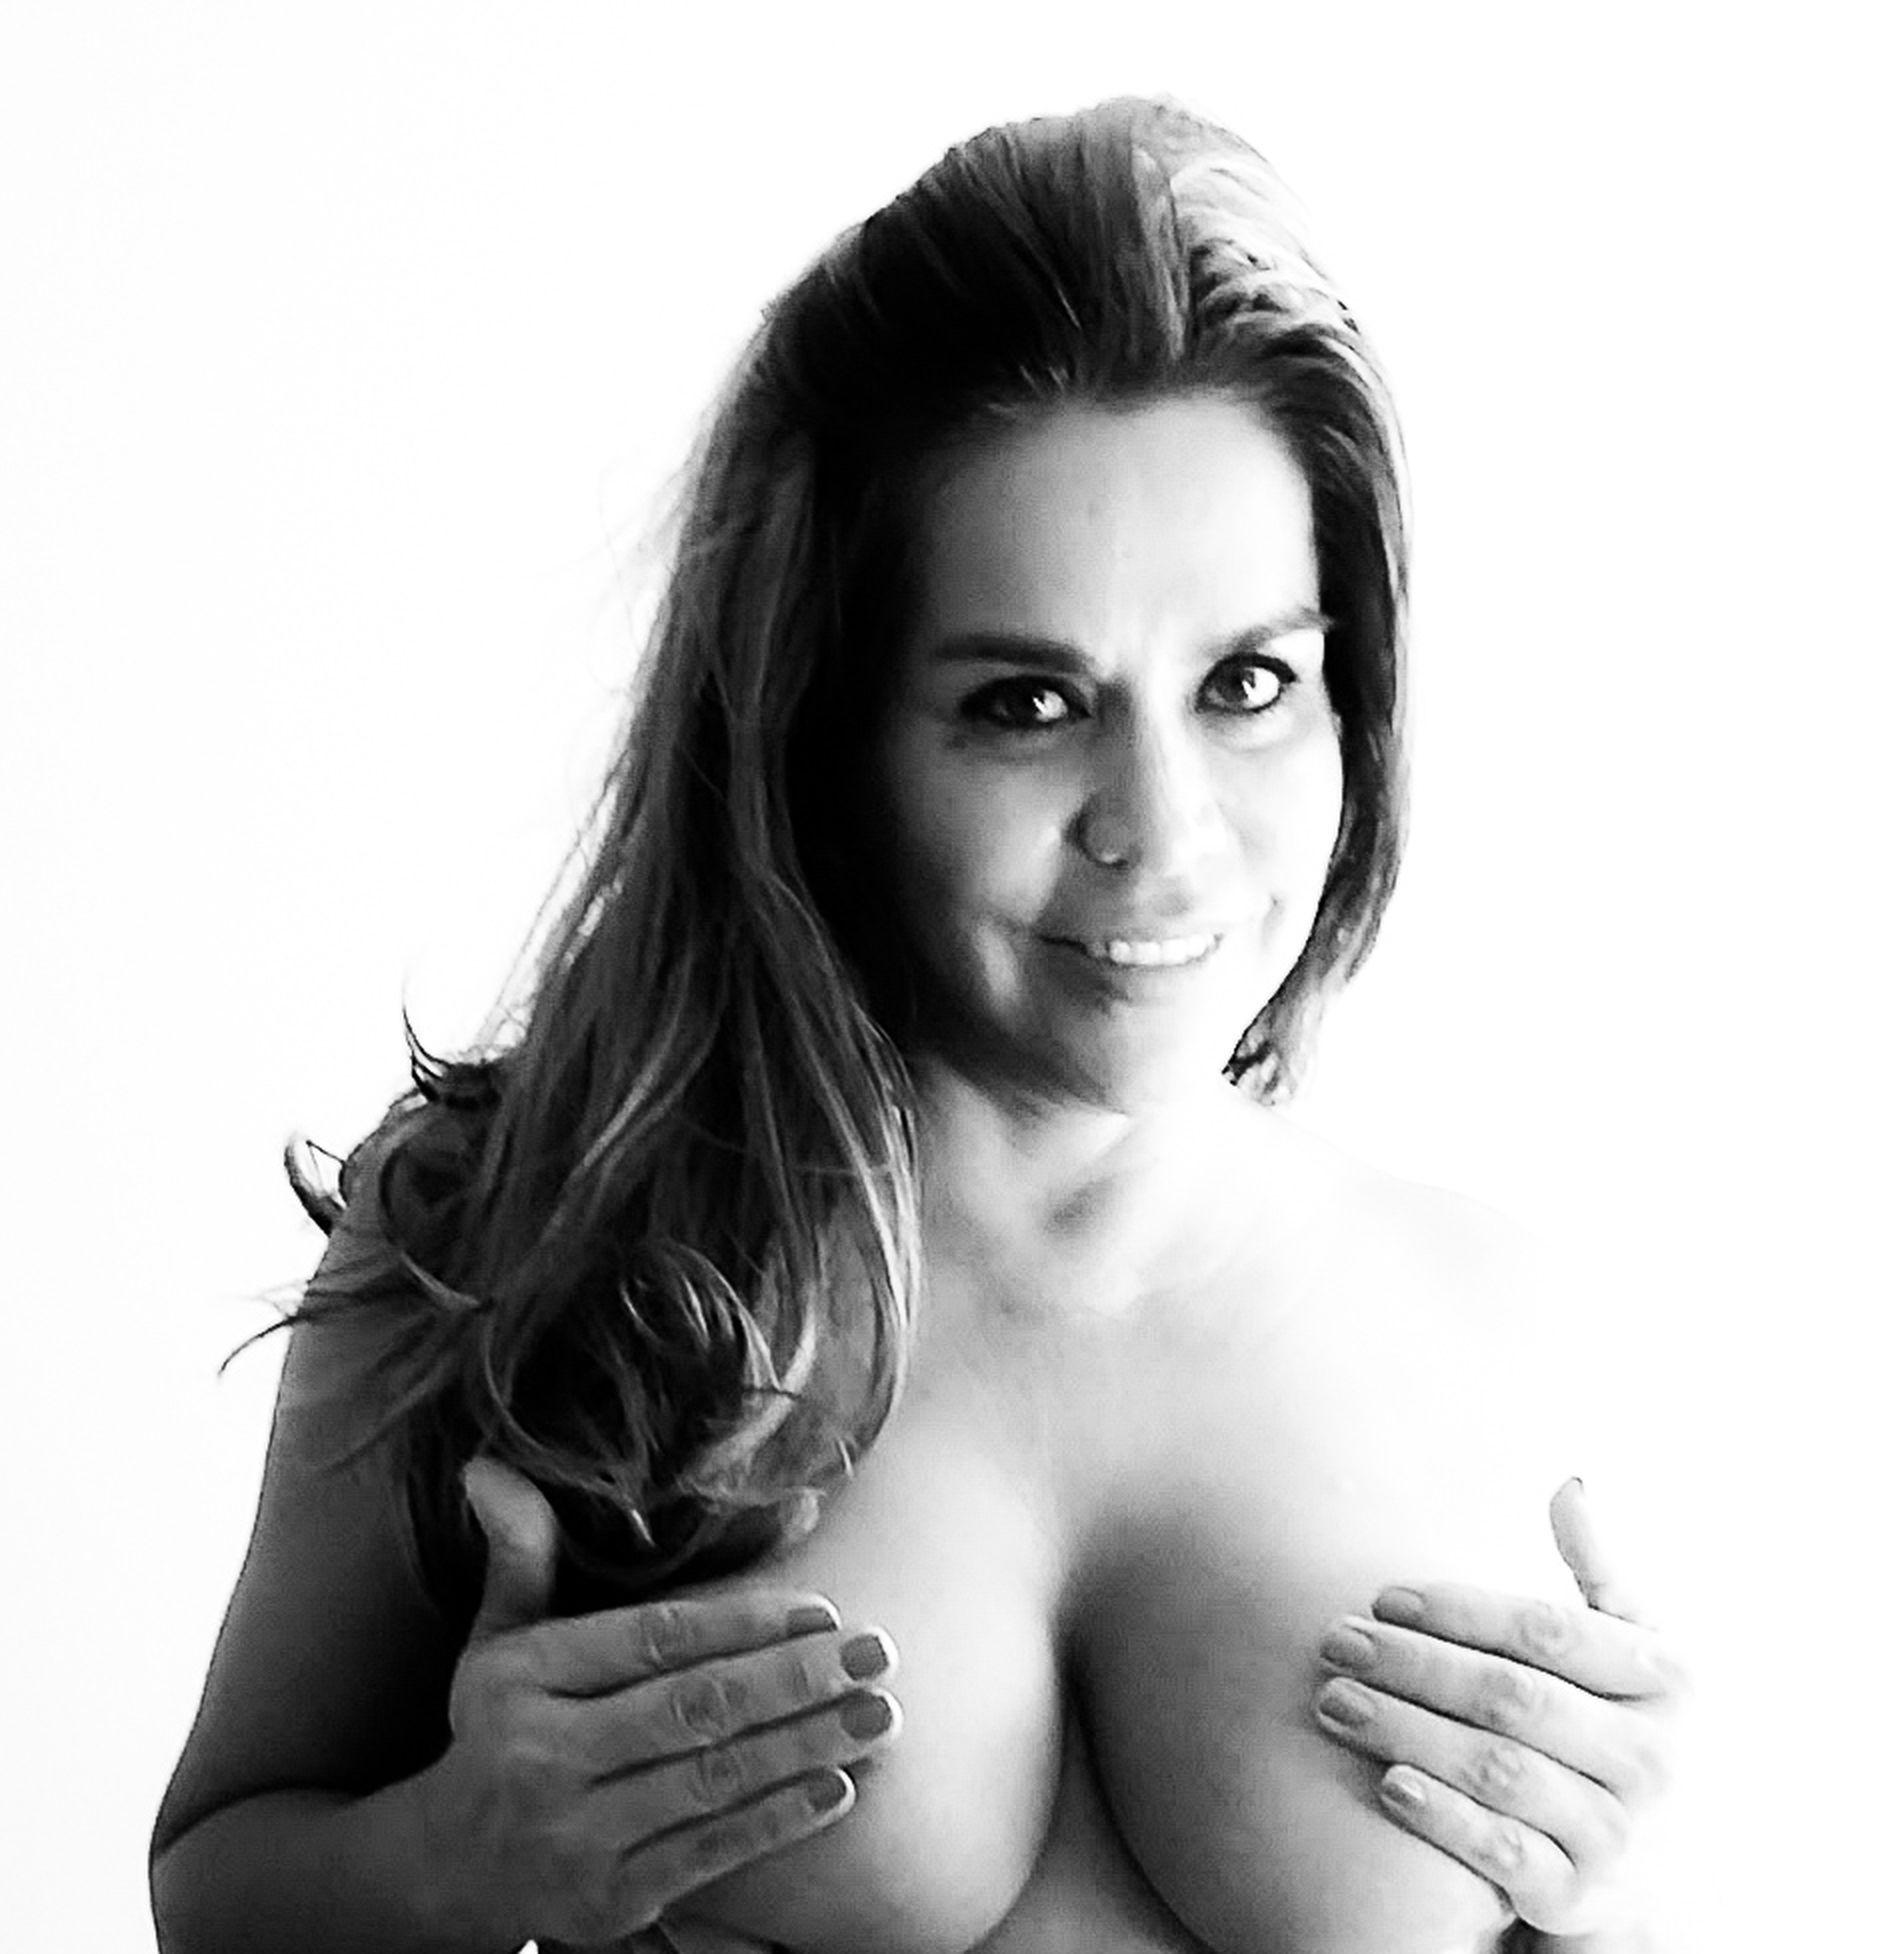 Nude daniela lazar Daniela Lazar